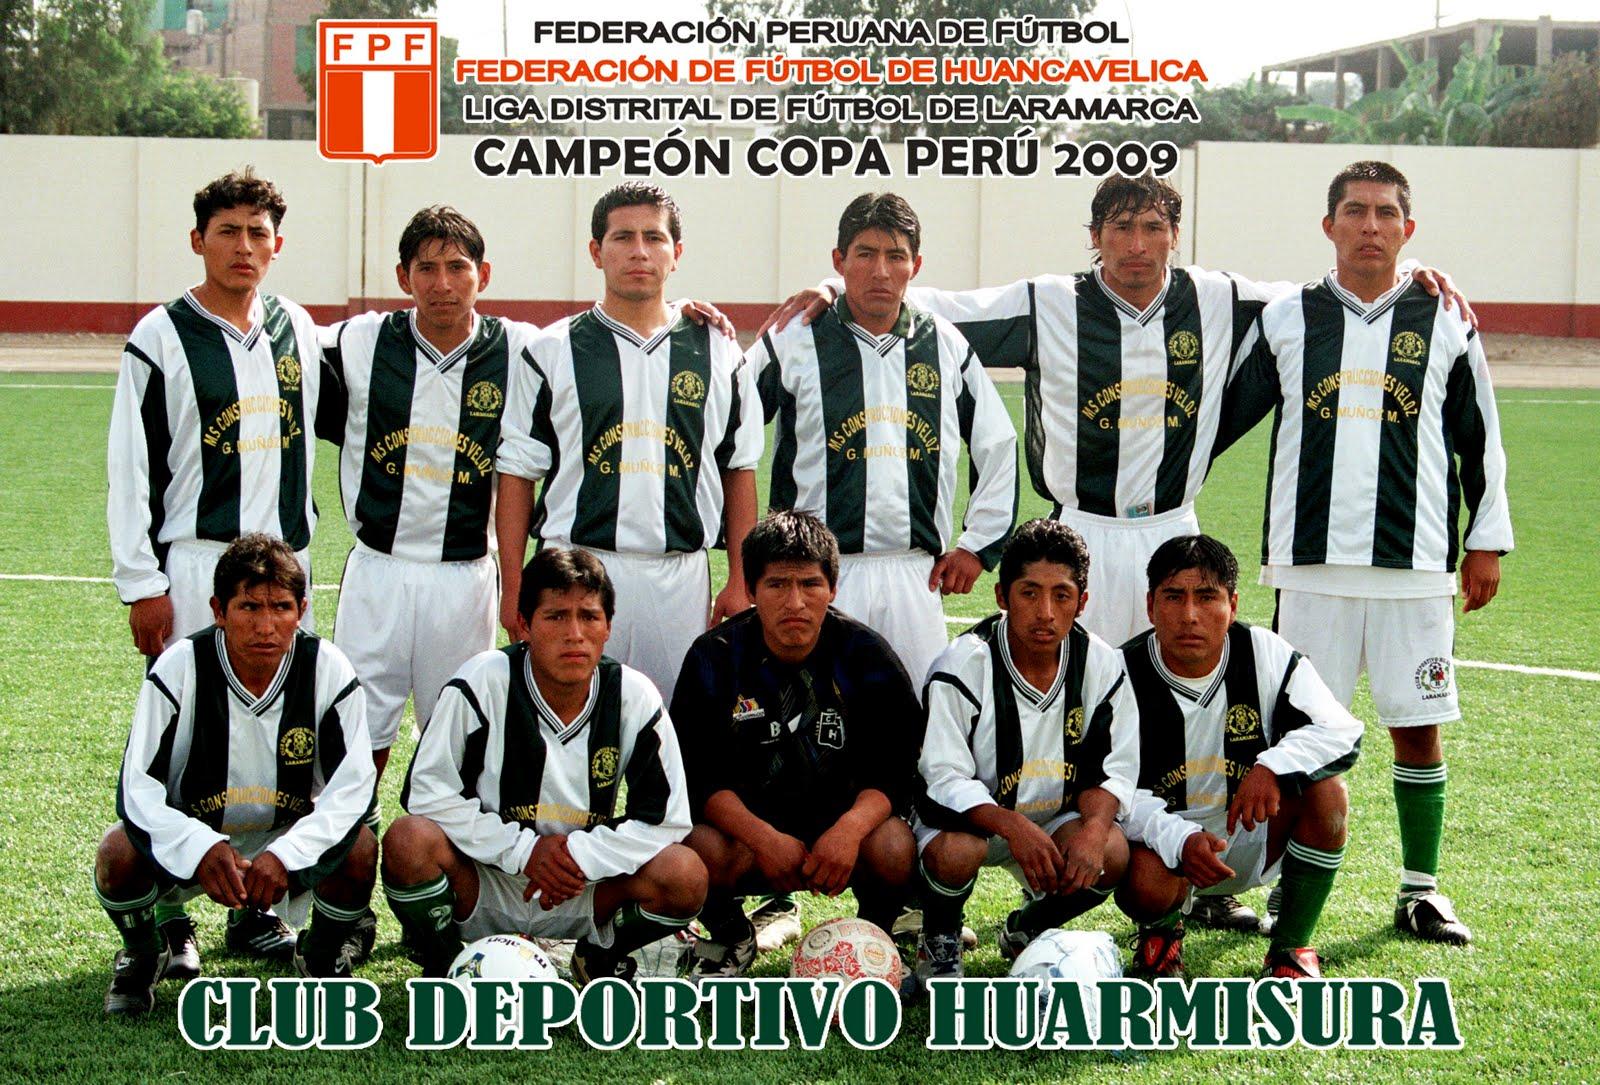 Huarmisura Campeón Copa Perú 2009 - 2010